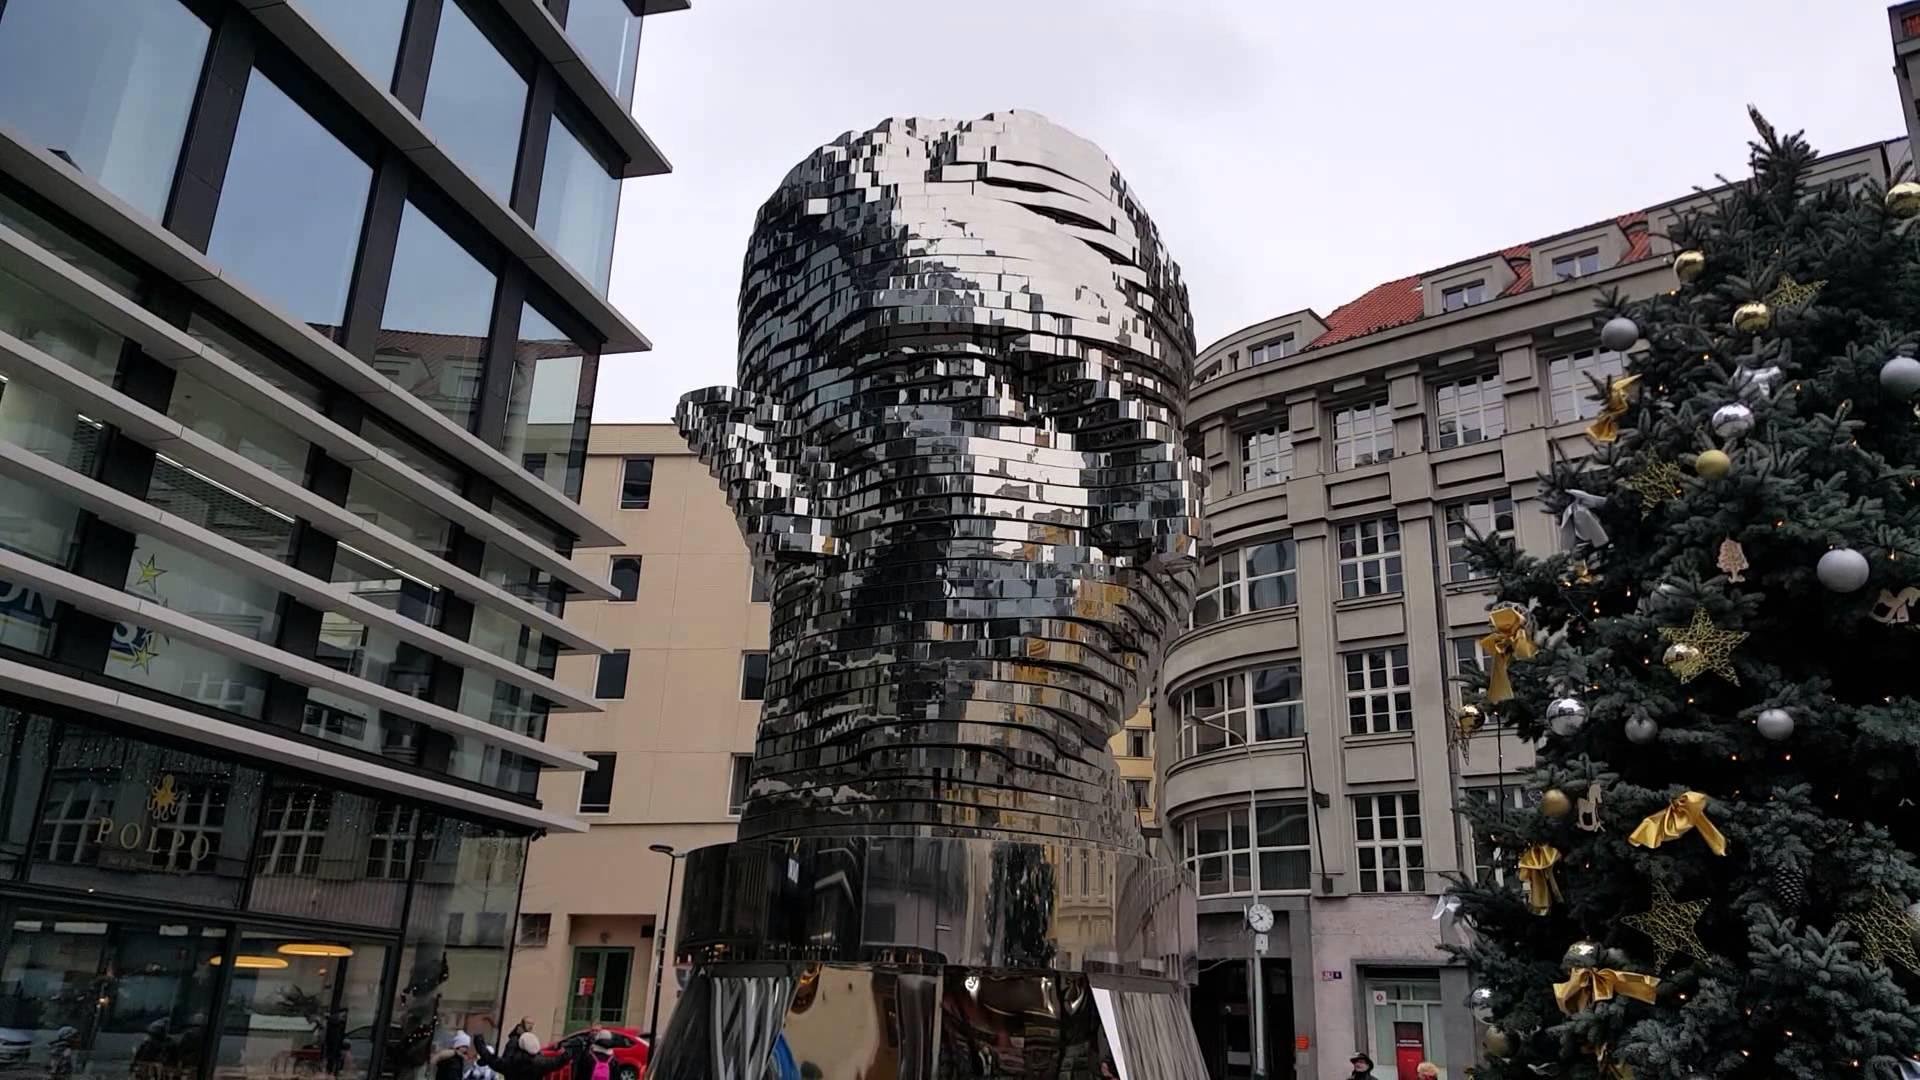 Памятник Францу Кафке работы Давида Черны